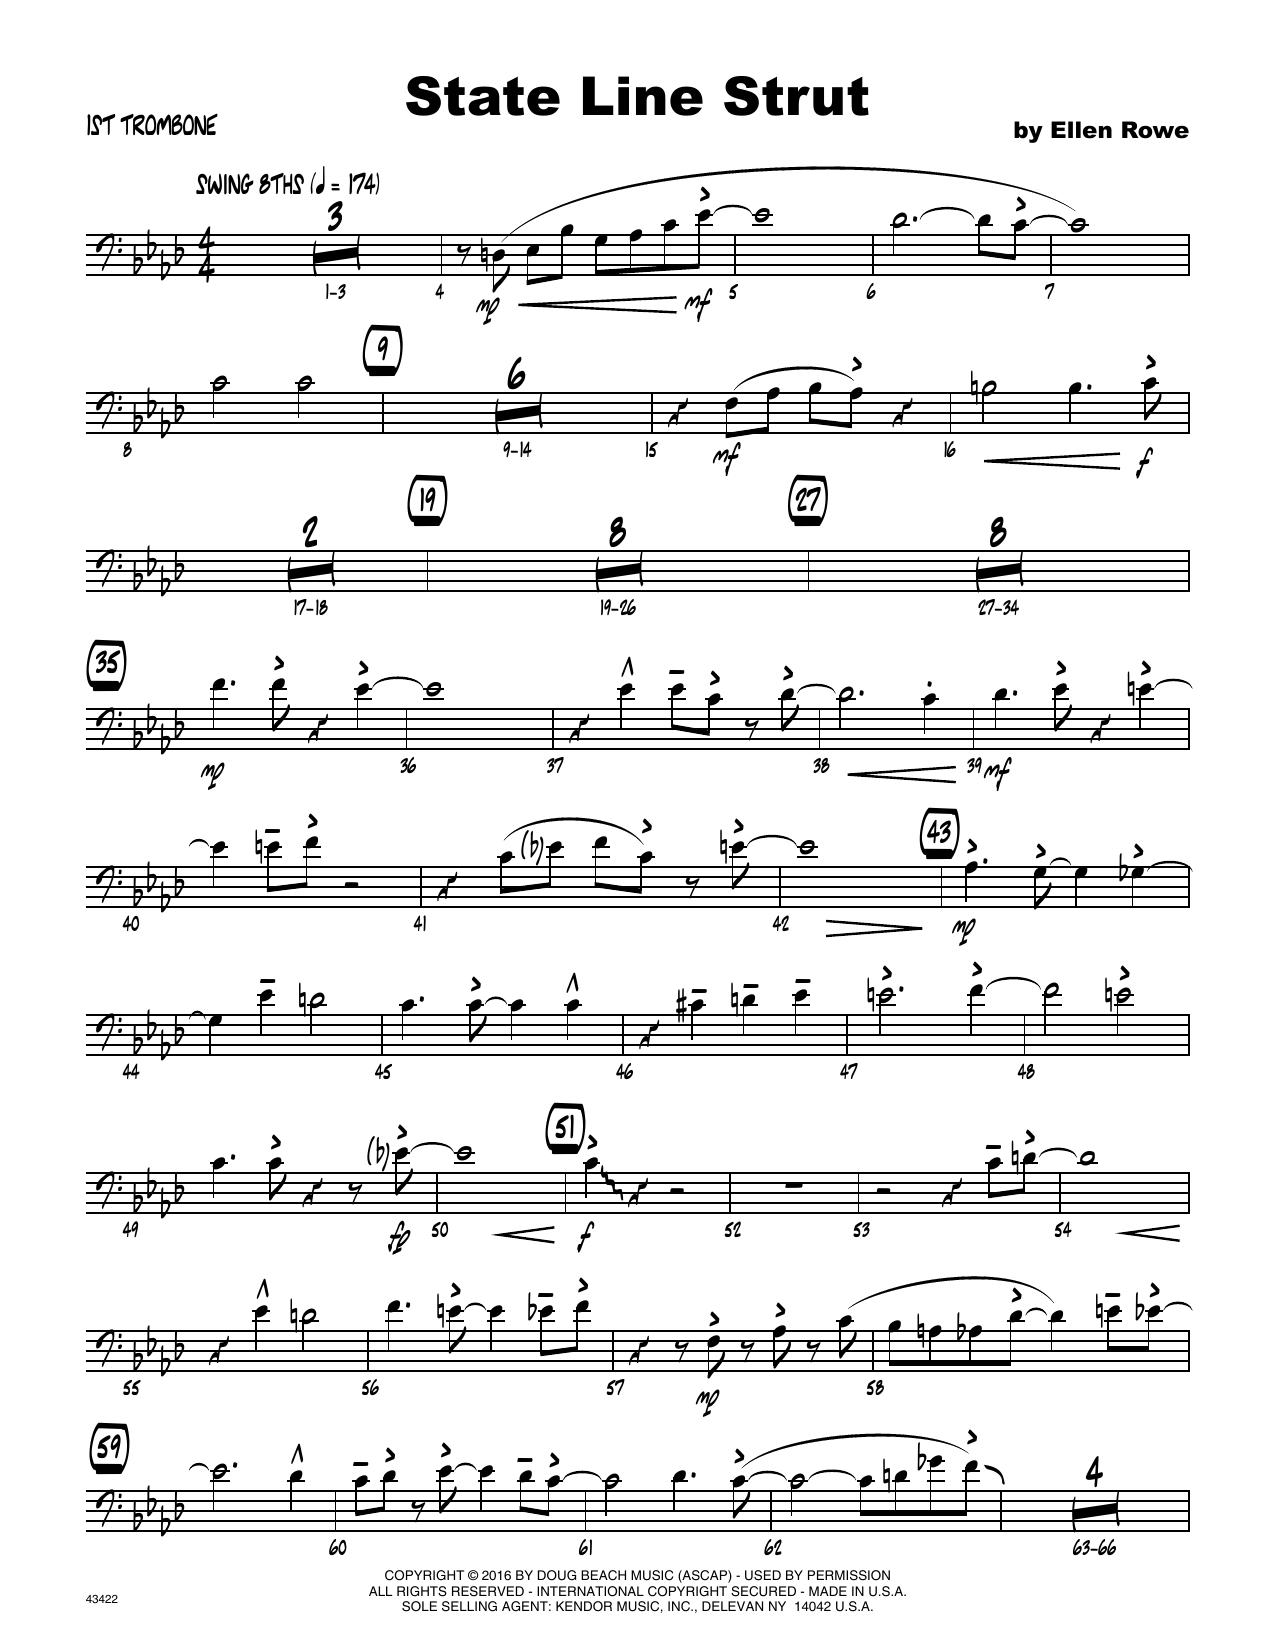 State Line Strut - 1st Trombone Sheet Music